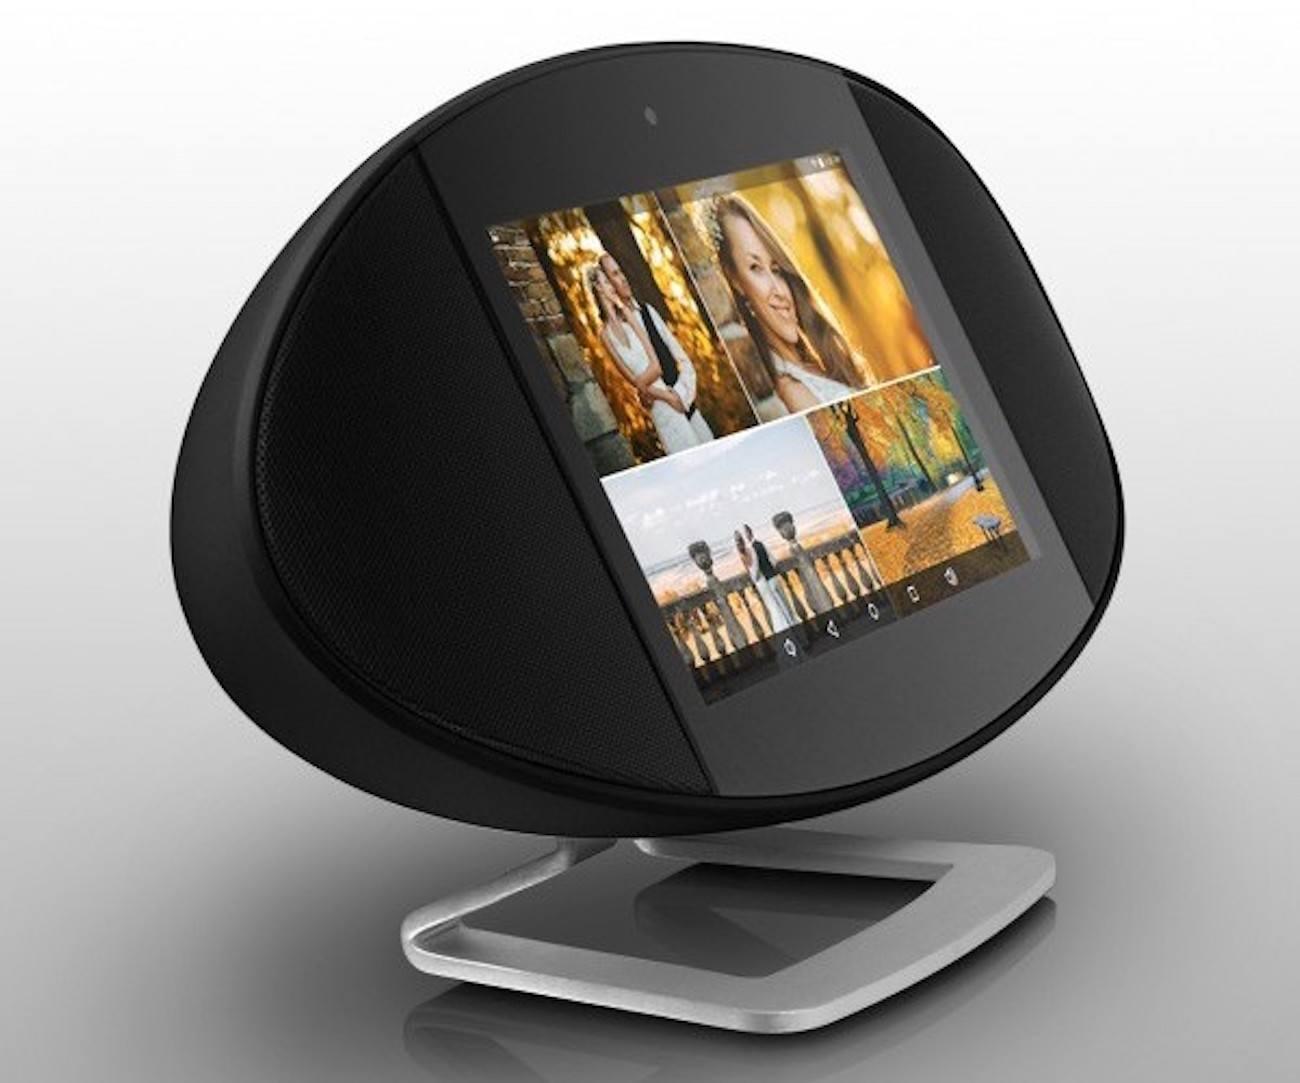 Aluratek Wi-Fi Media Player